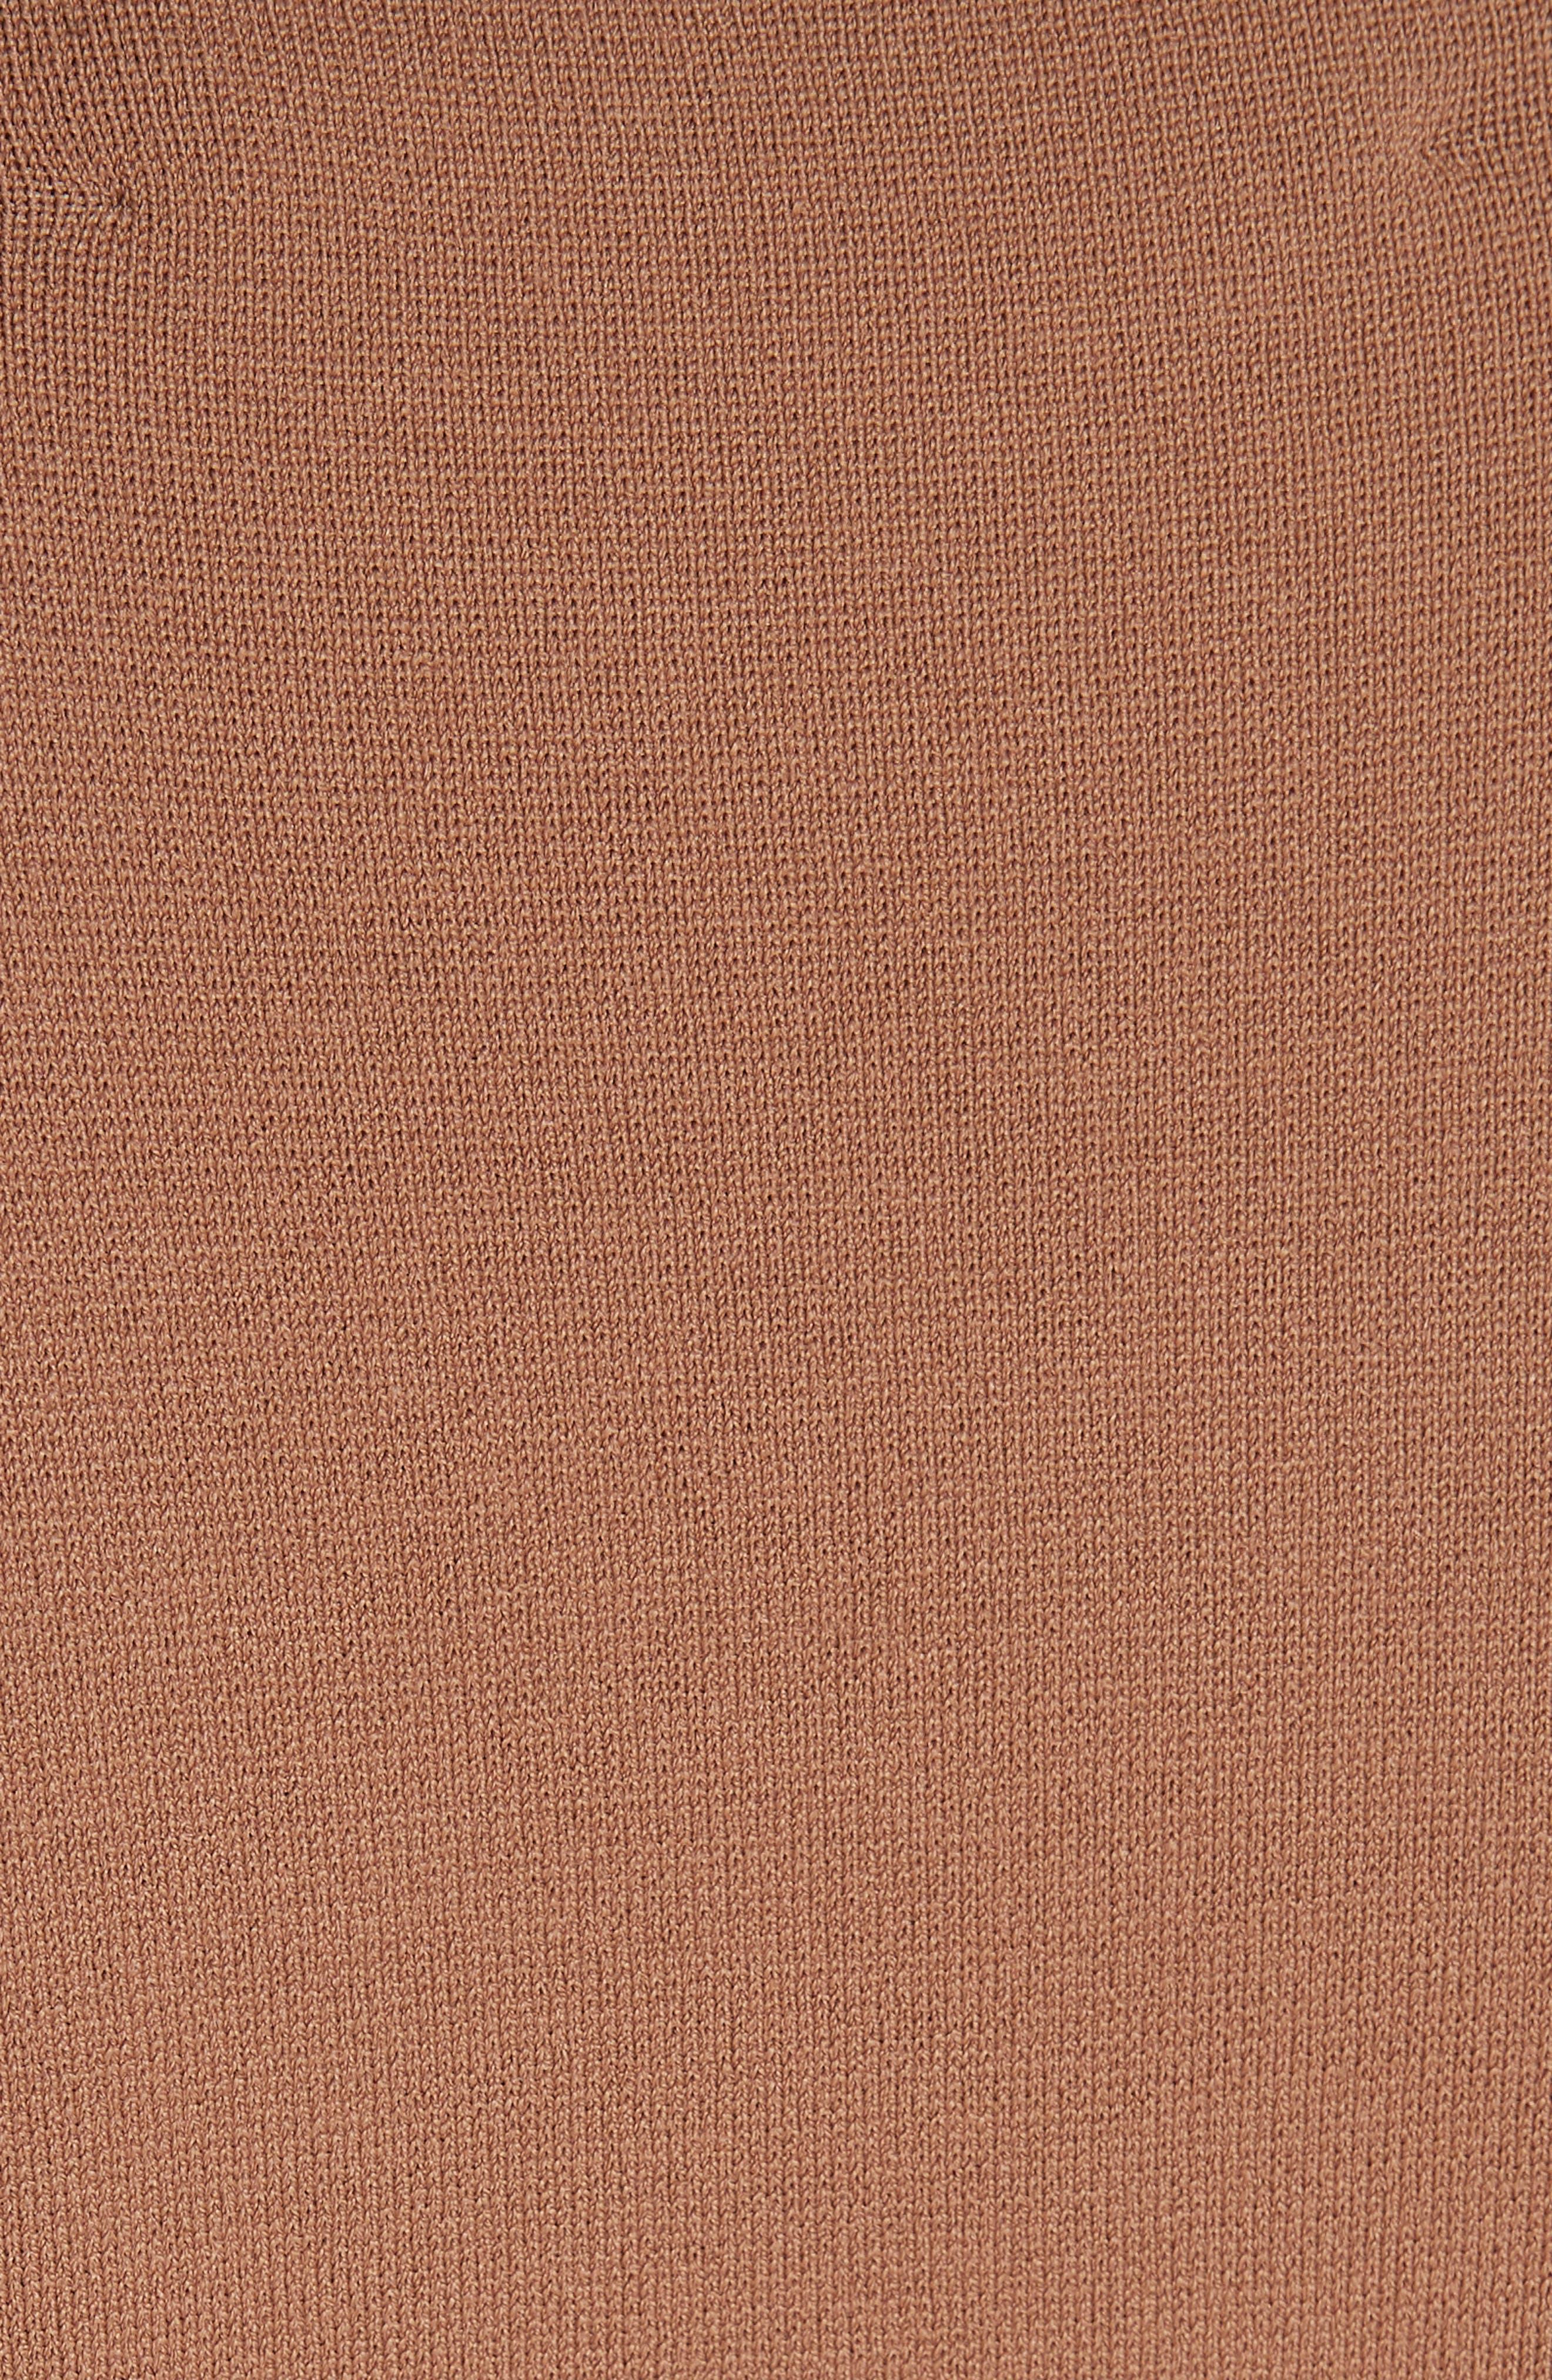 Diane von Furstenberg Knit Wrap Dress,                             Alternate thumbnail 5, color,                             WALNUT